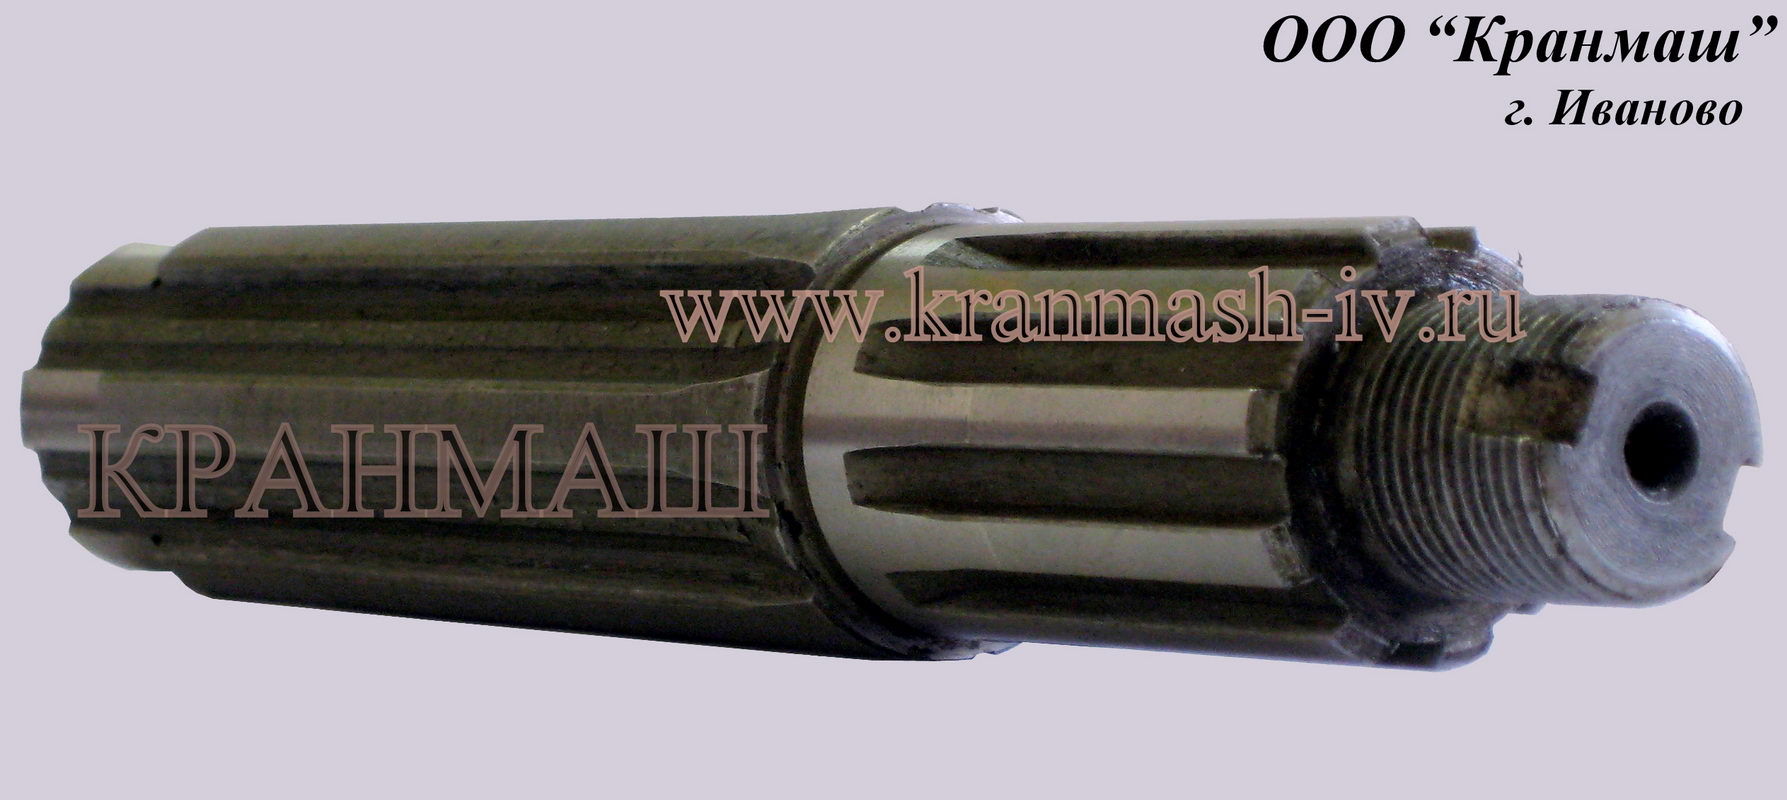 Вал МП-05717.14.103